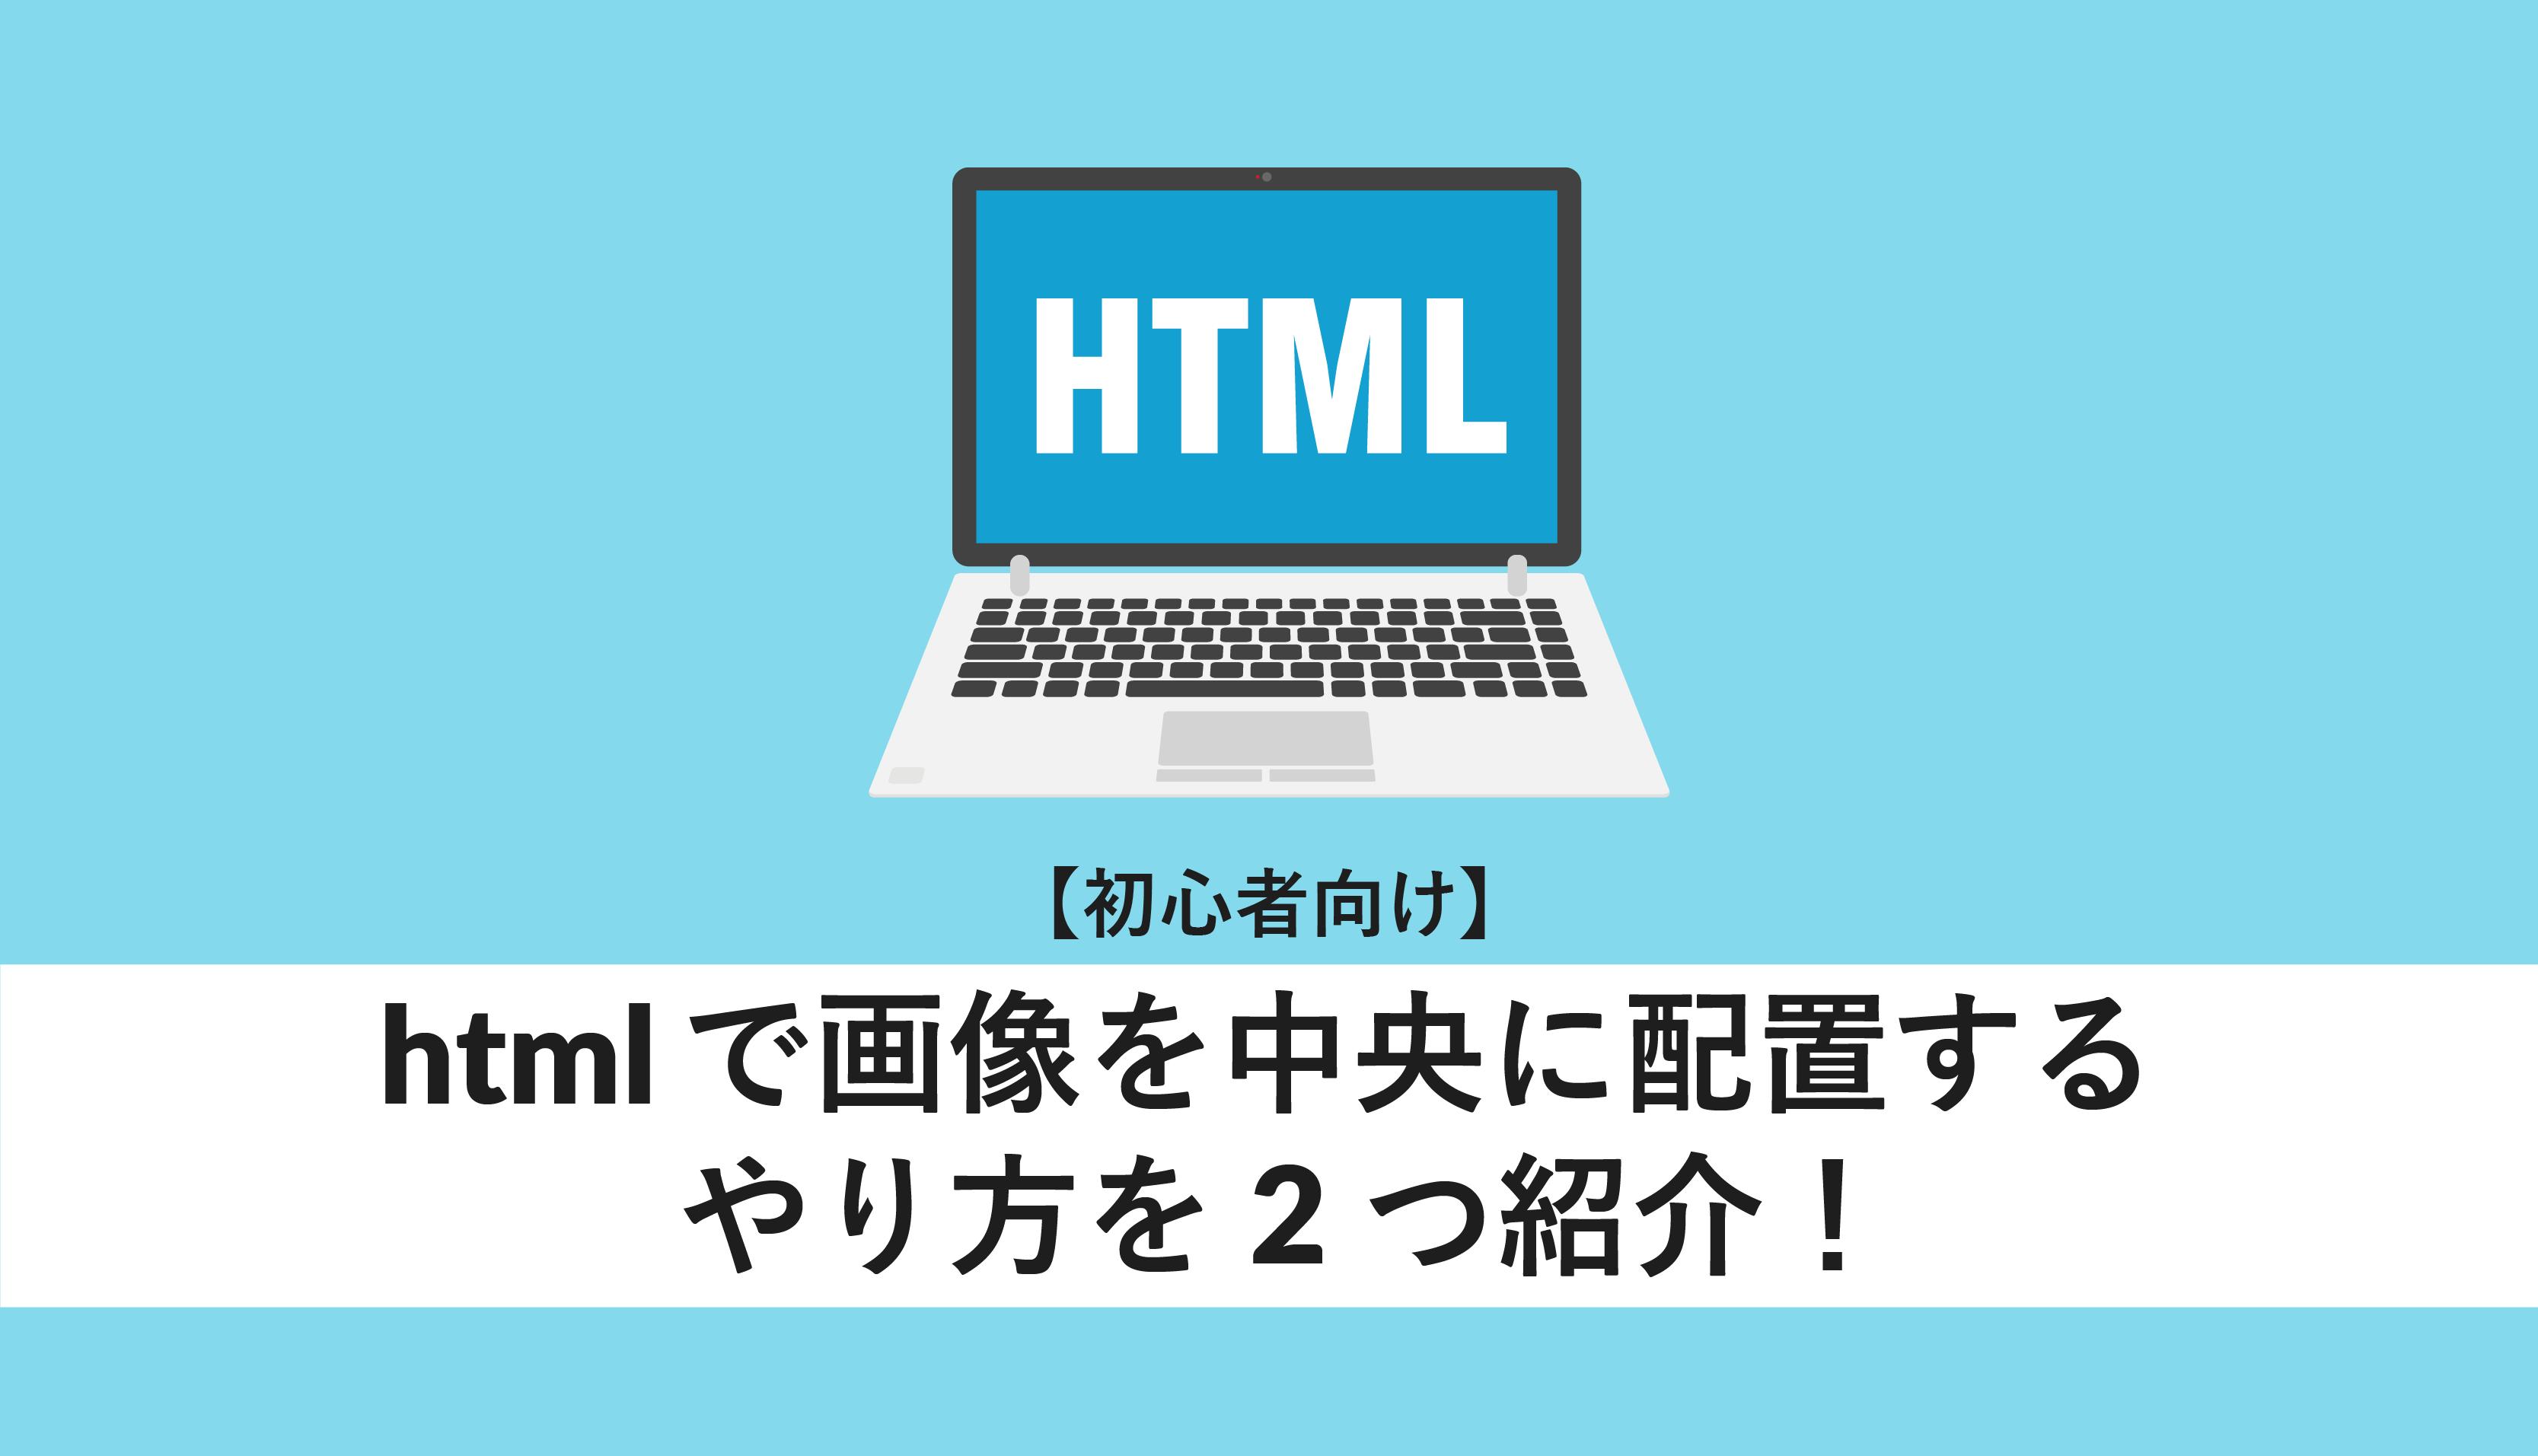 html 画像 中央